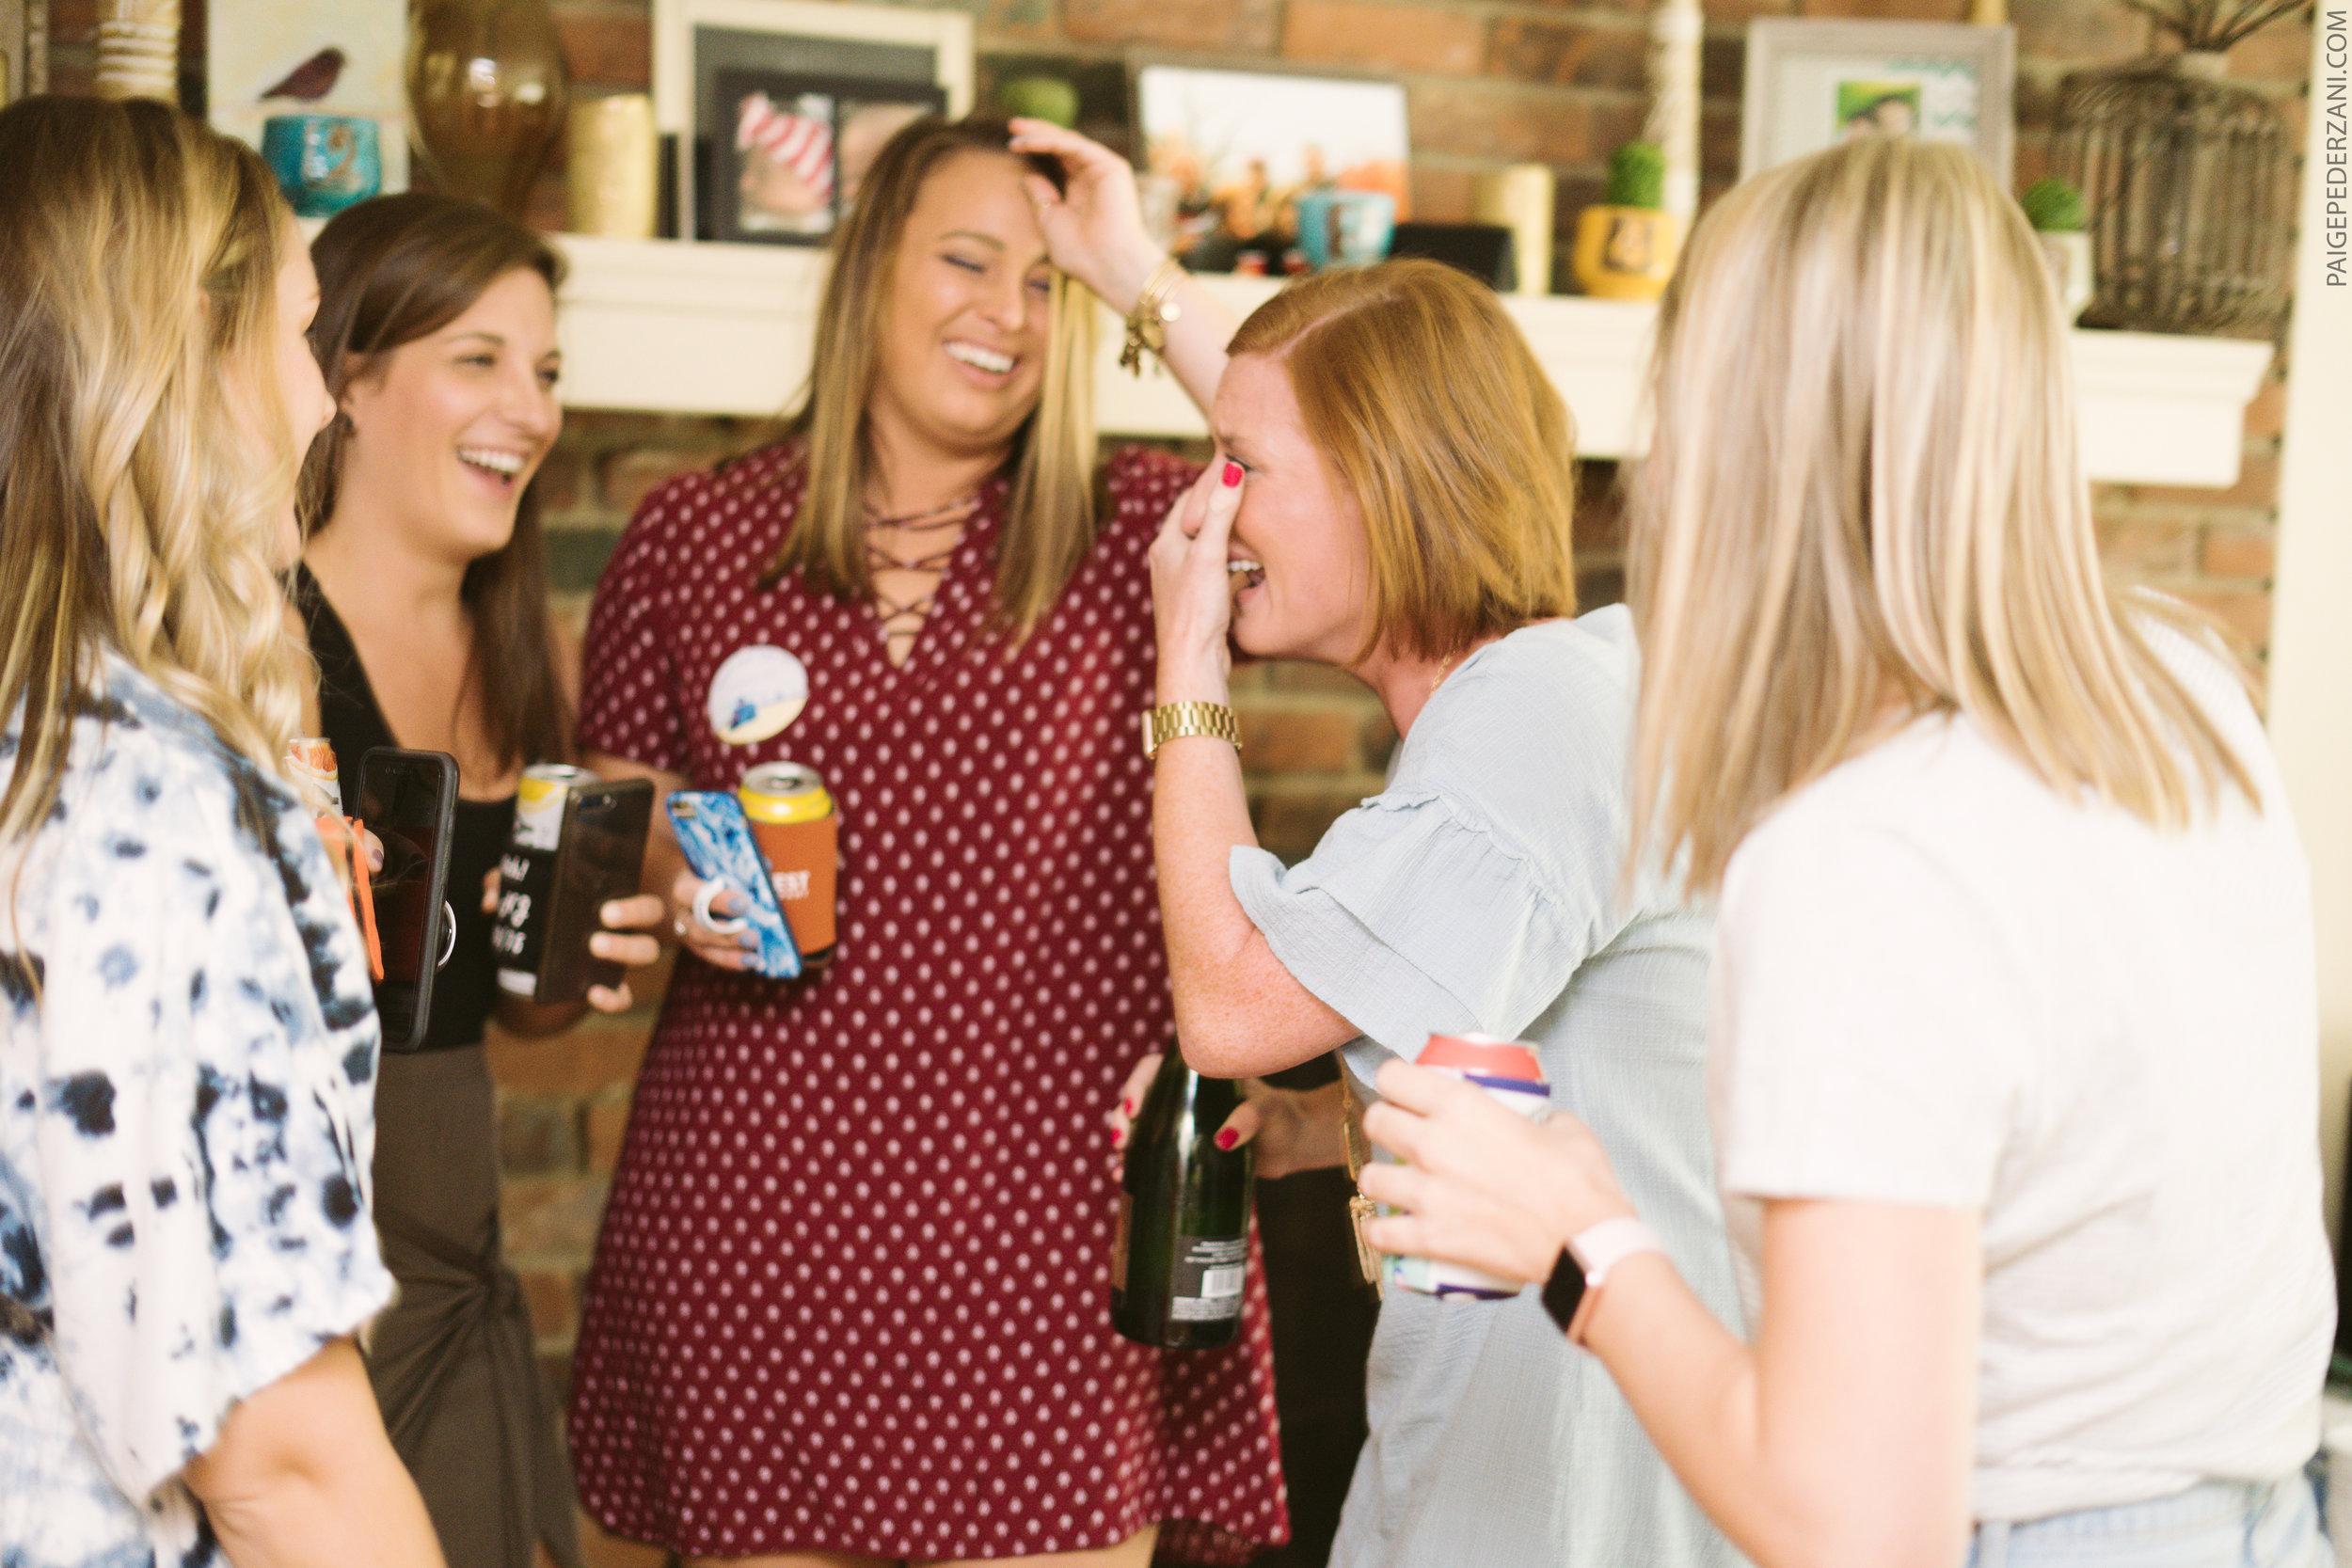 Cincinnati Engagement Photographer Surprise Engagement Party - surprise engagement party